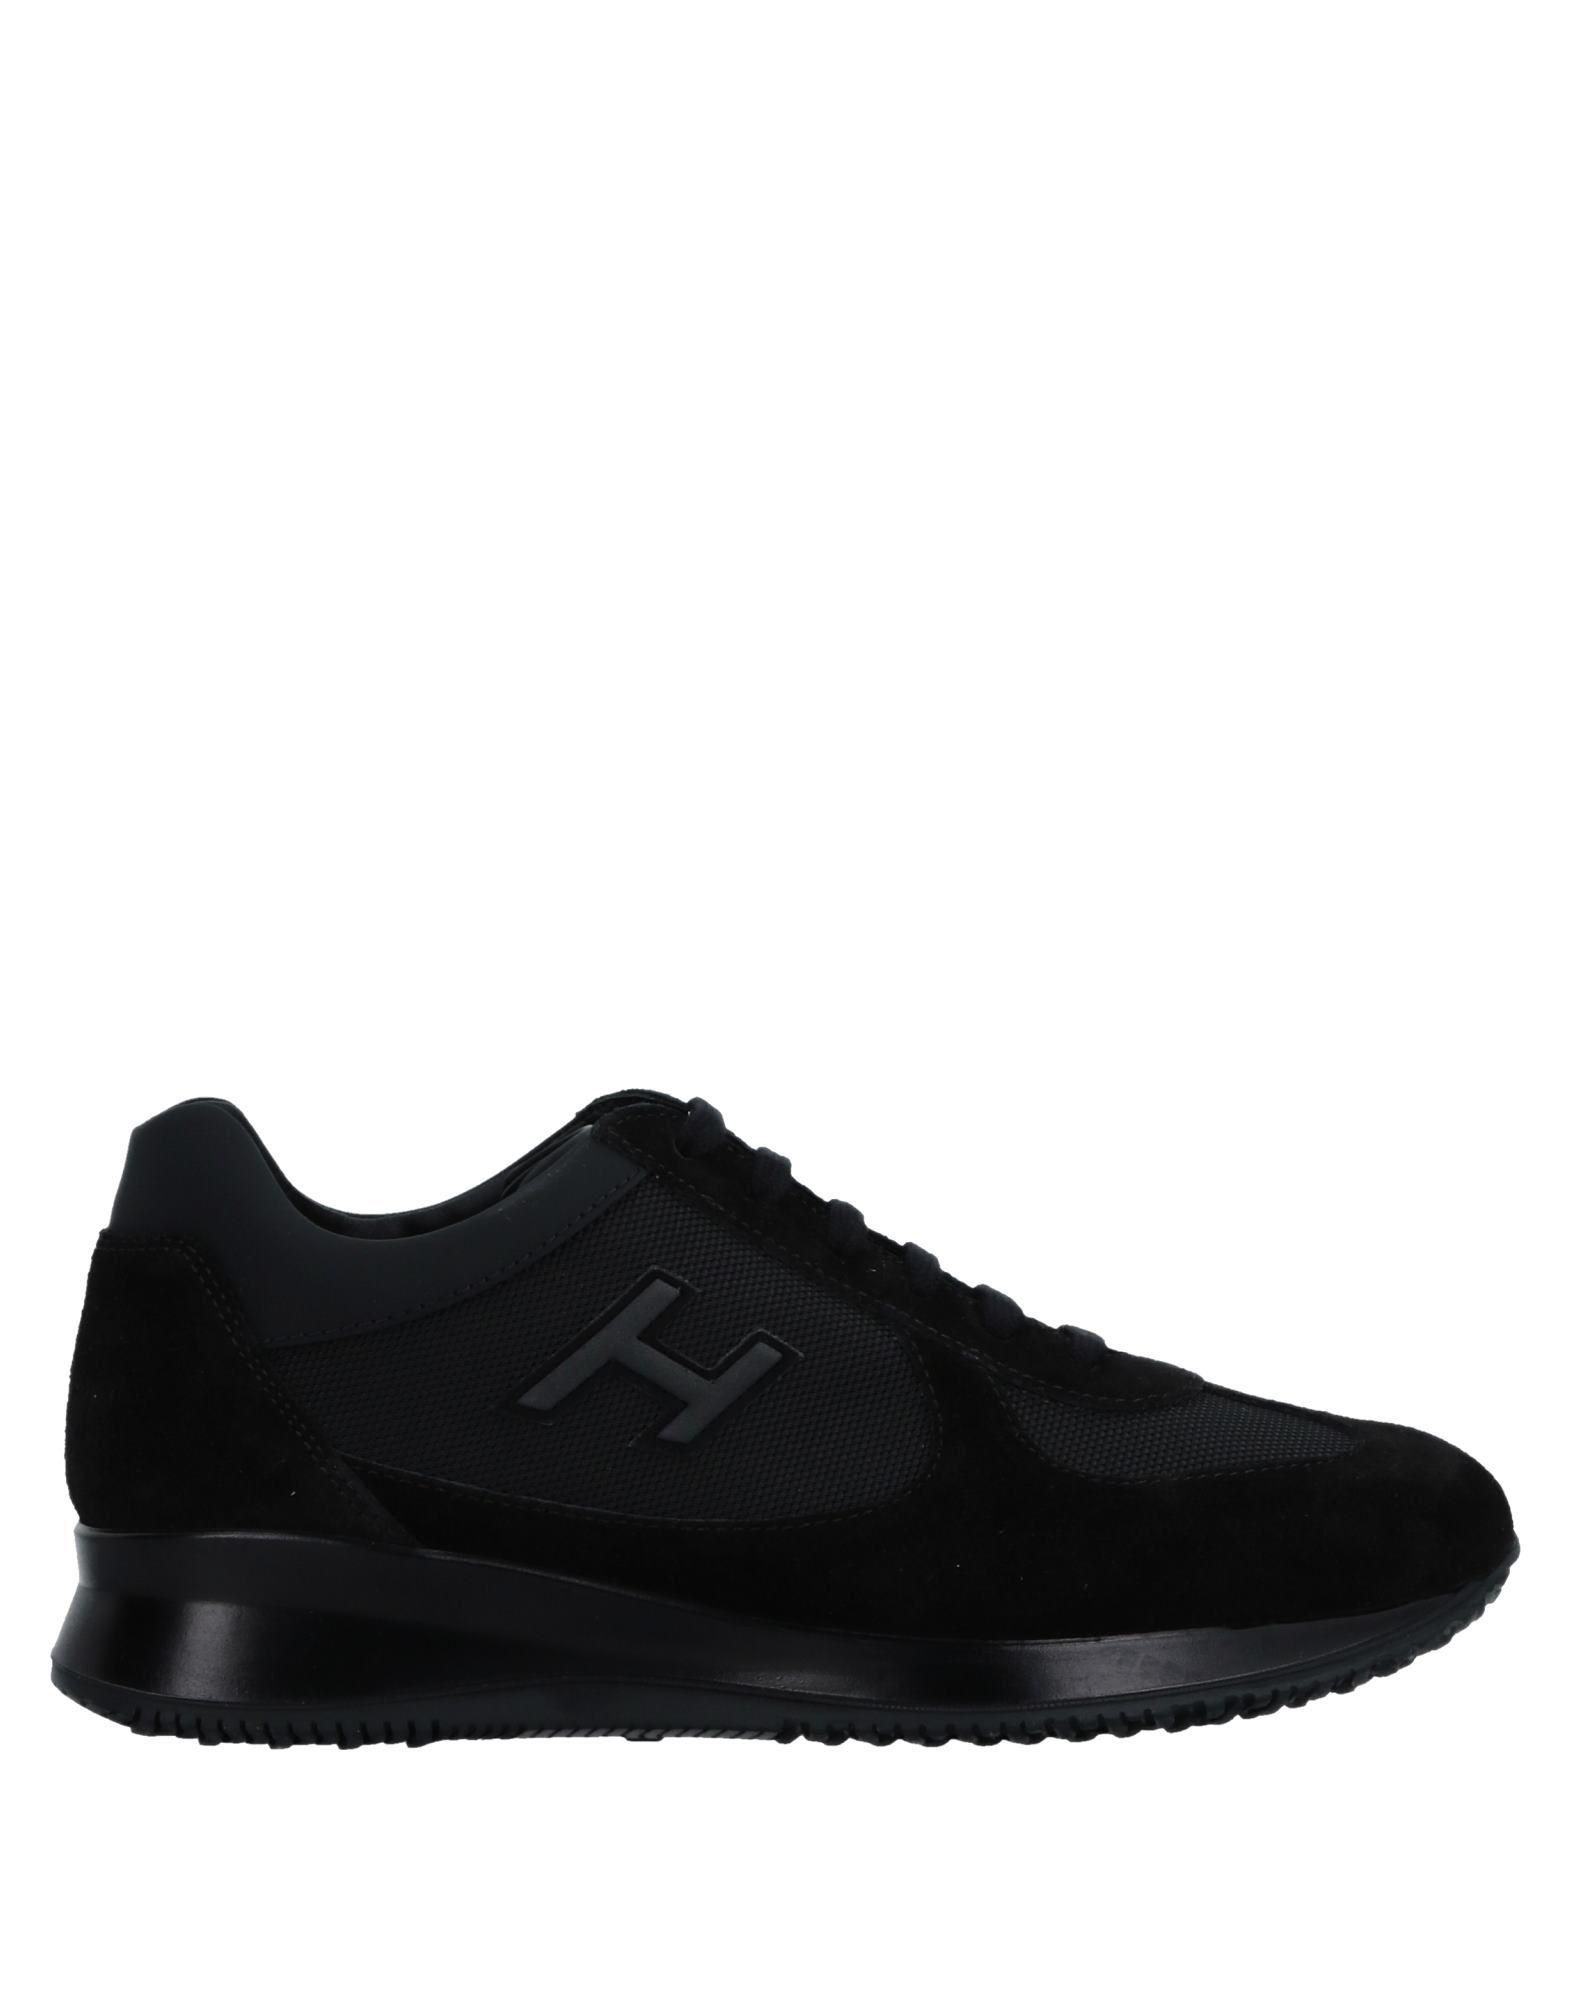 Hogan Sneakers Herren  11289872XR Gute Qualität beliebte Schuhe